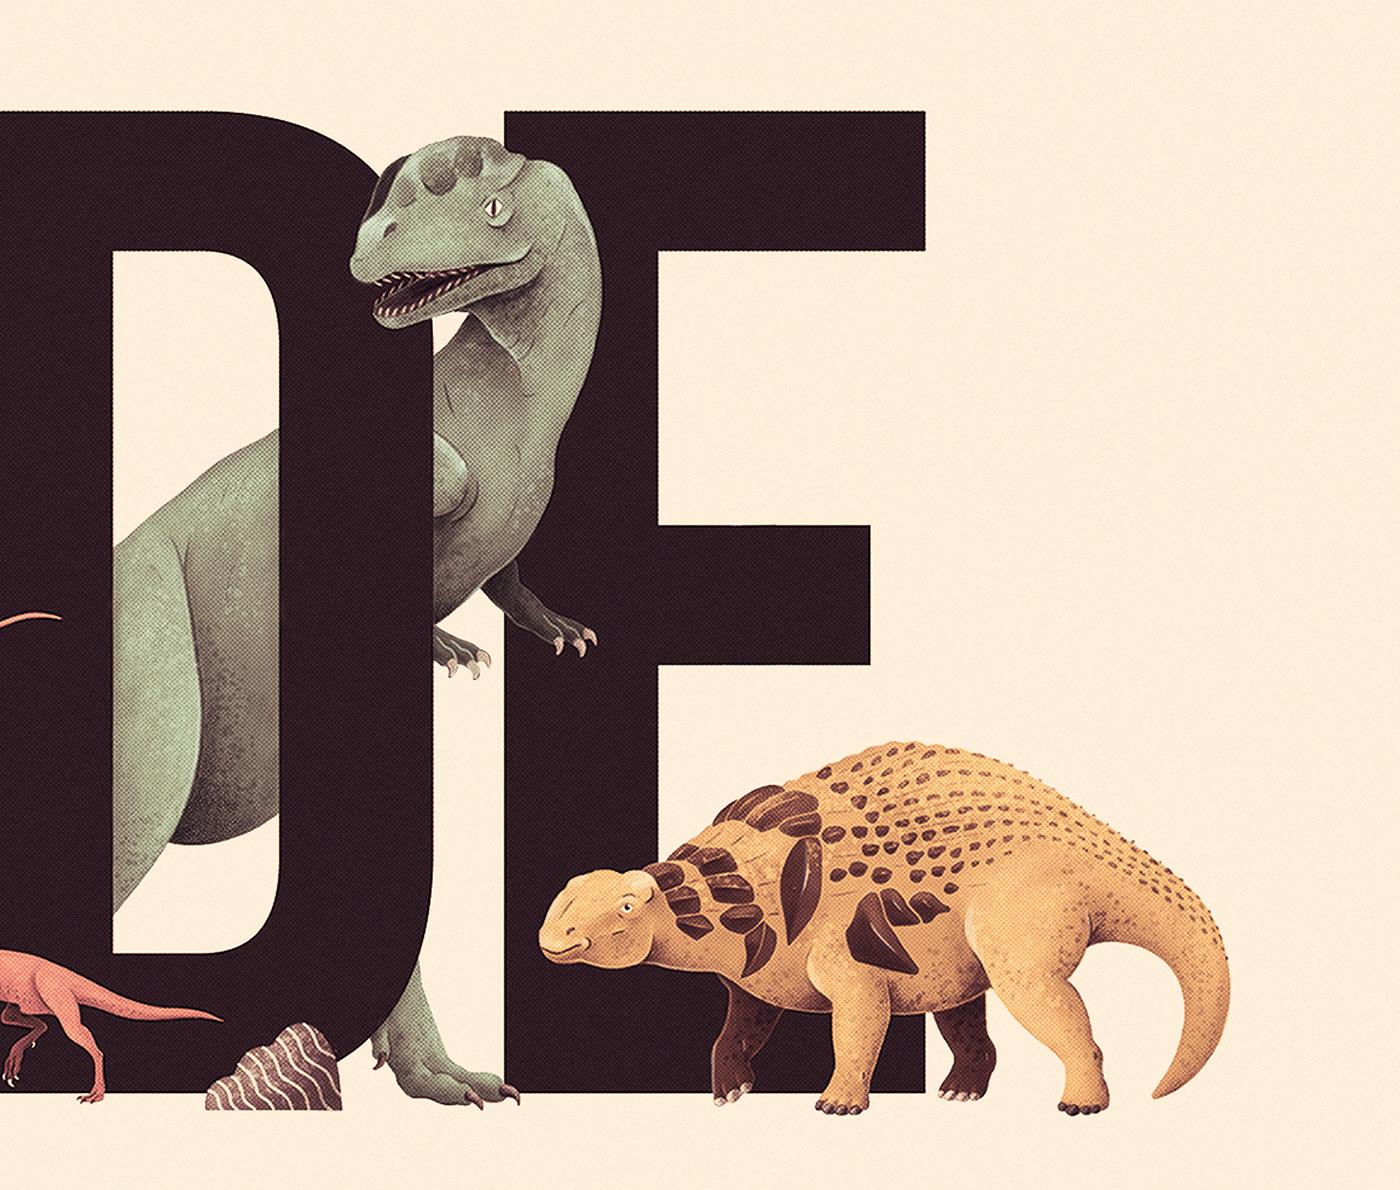 36daysoftype 36daysoftype2020 ABC abecedario alphabet Dino Dinosaur Dinosaurios ILLUSTRATION  vintage